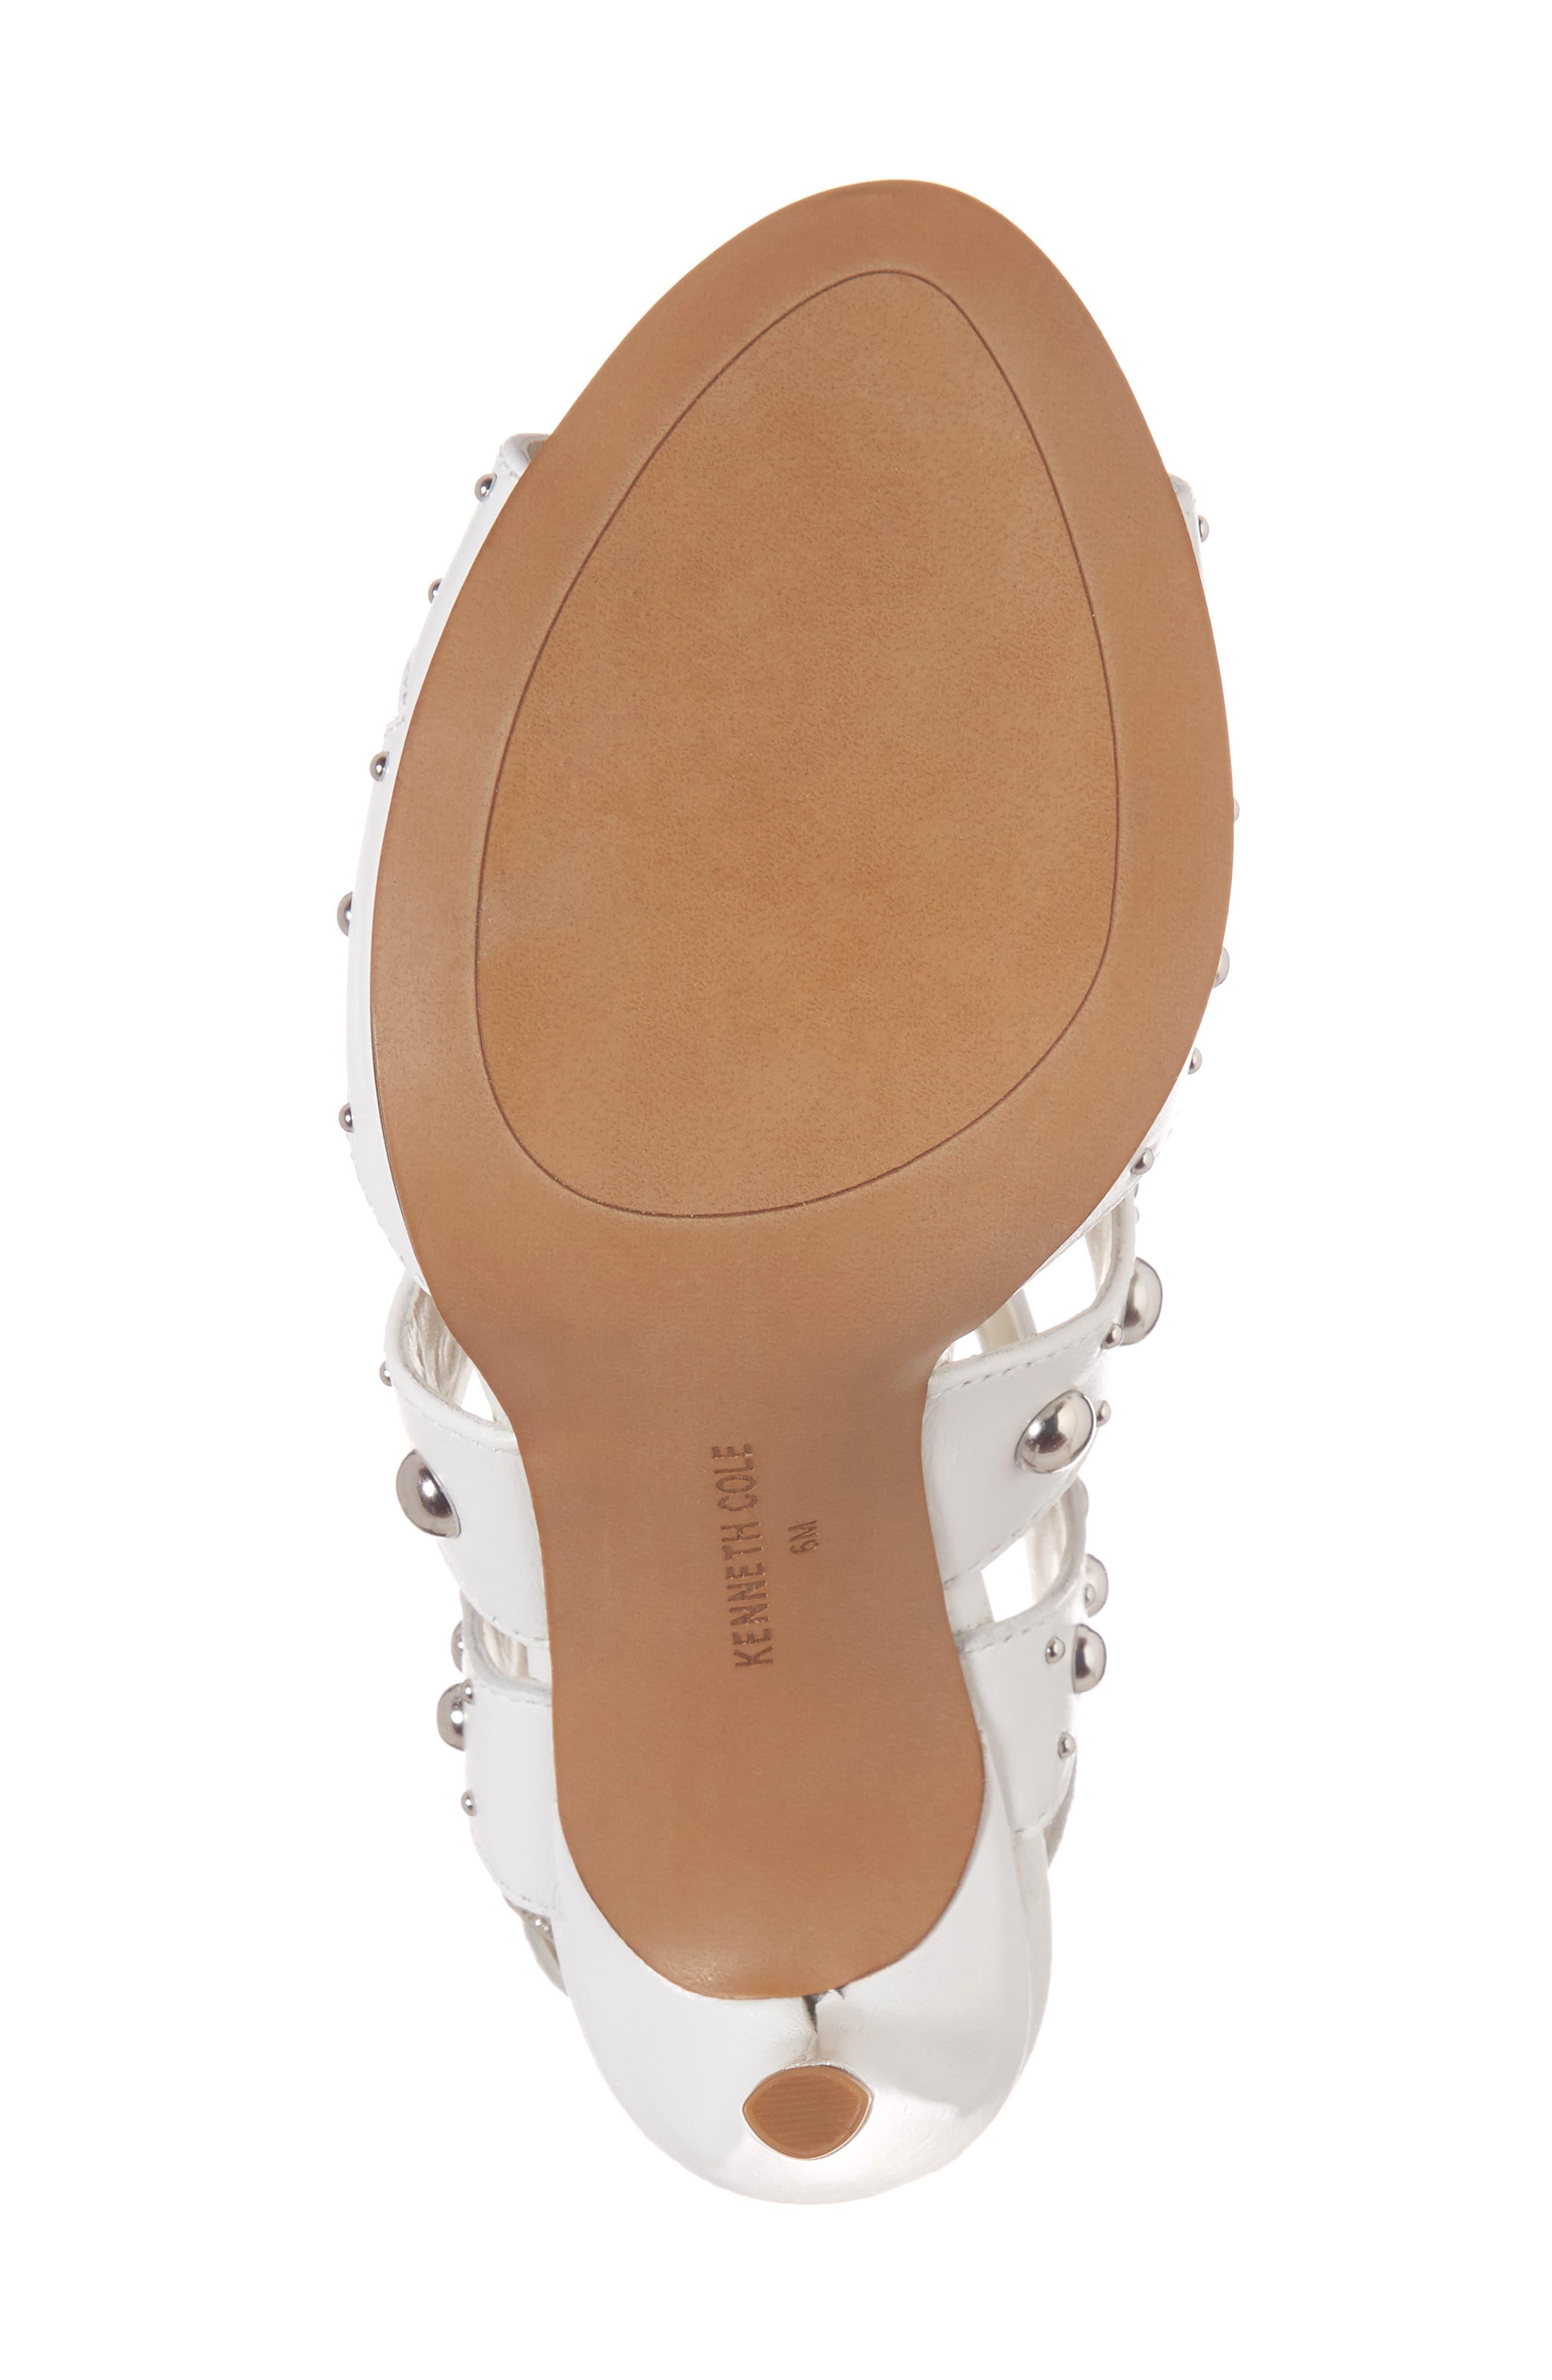 Baldwin Stud Sandal,                             Alternate thumbnail 6, color,                             White Leather